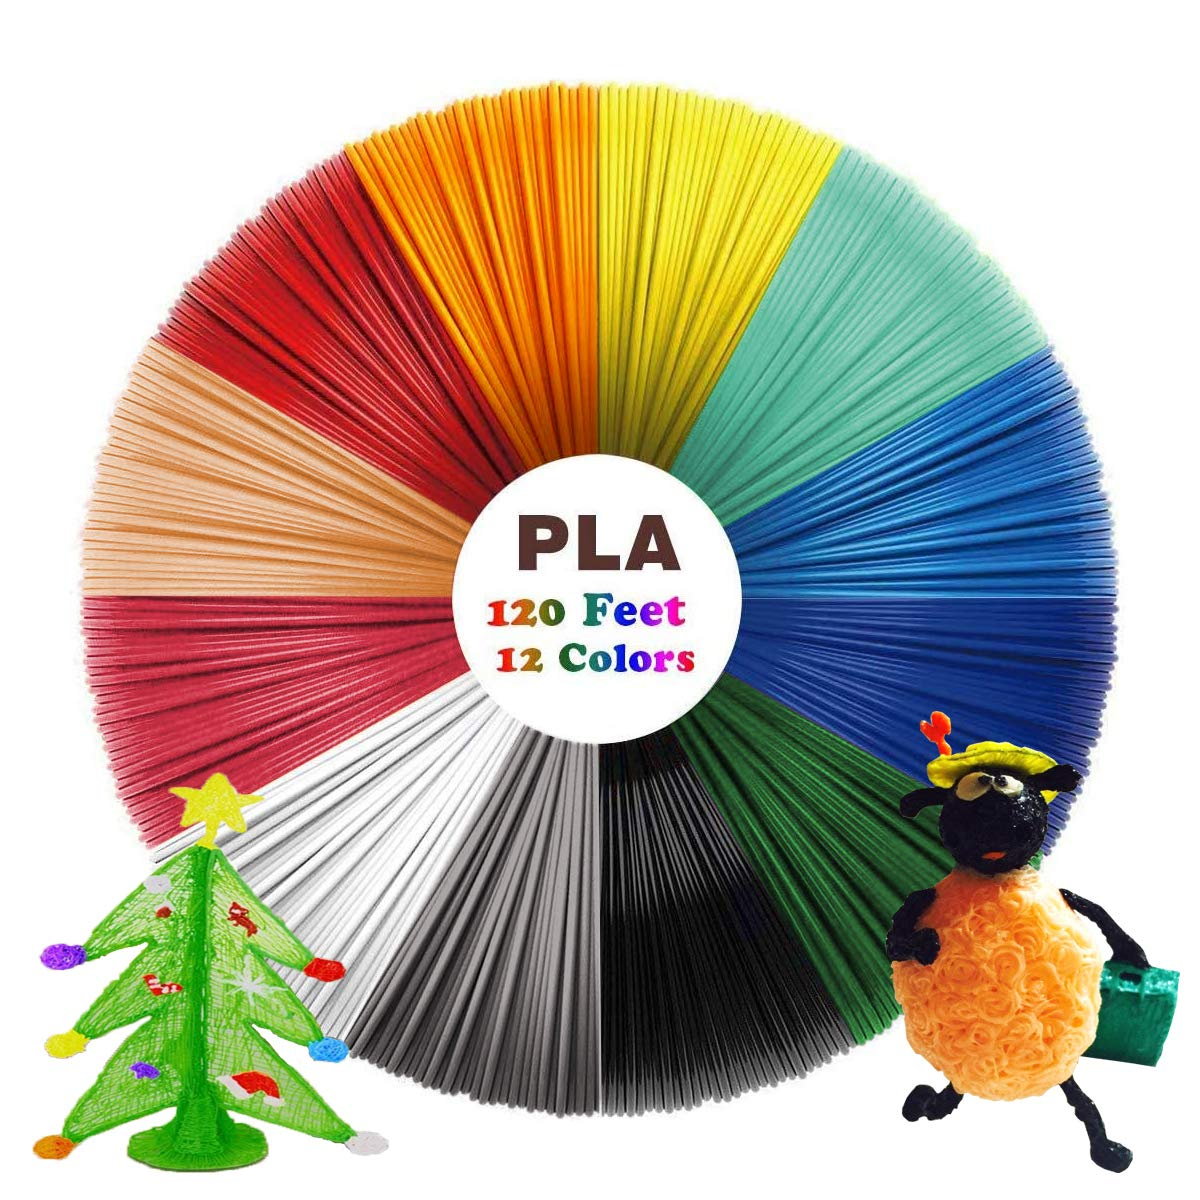 Phattopa 3D Drawing Printing Pen Filaments 3D Pen Filament Refills PLA 1.75mm PLA Filament Refills 3D Printer Filament 12 Colors, Each Color 10ft